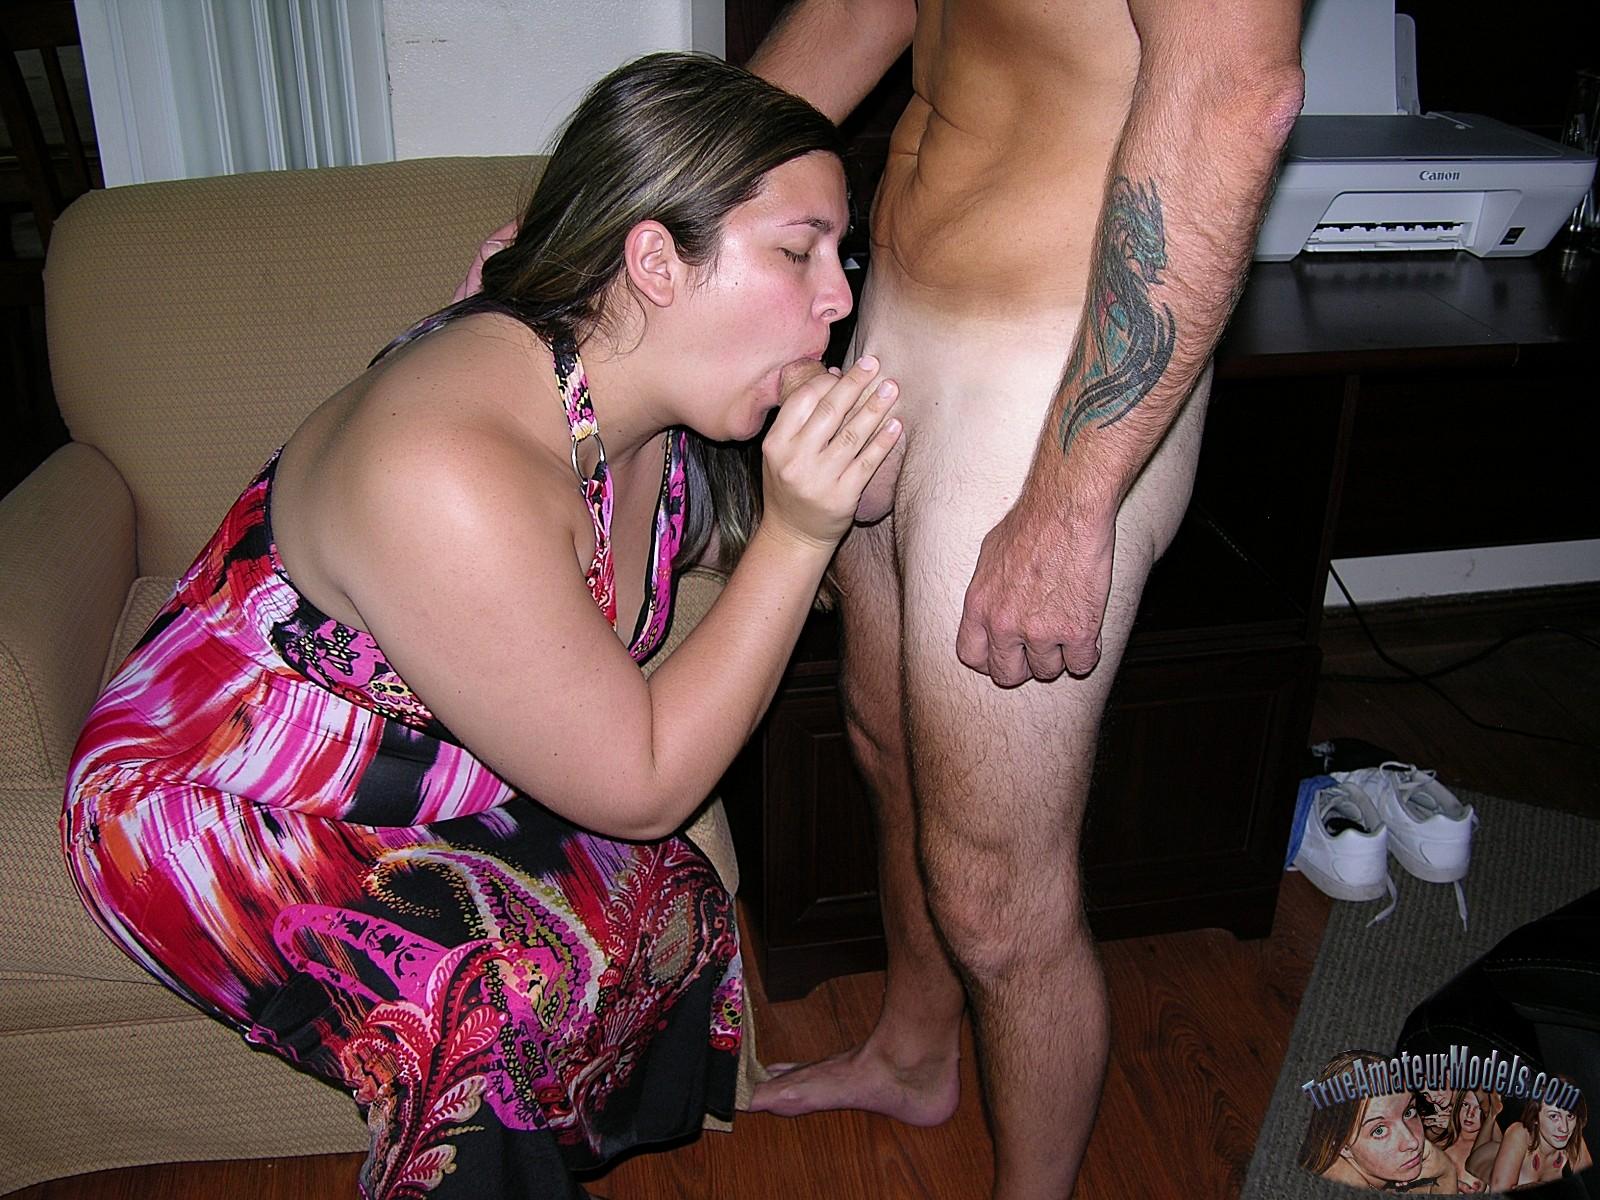 Sharing my wife mmf